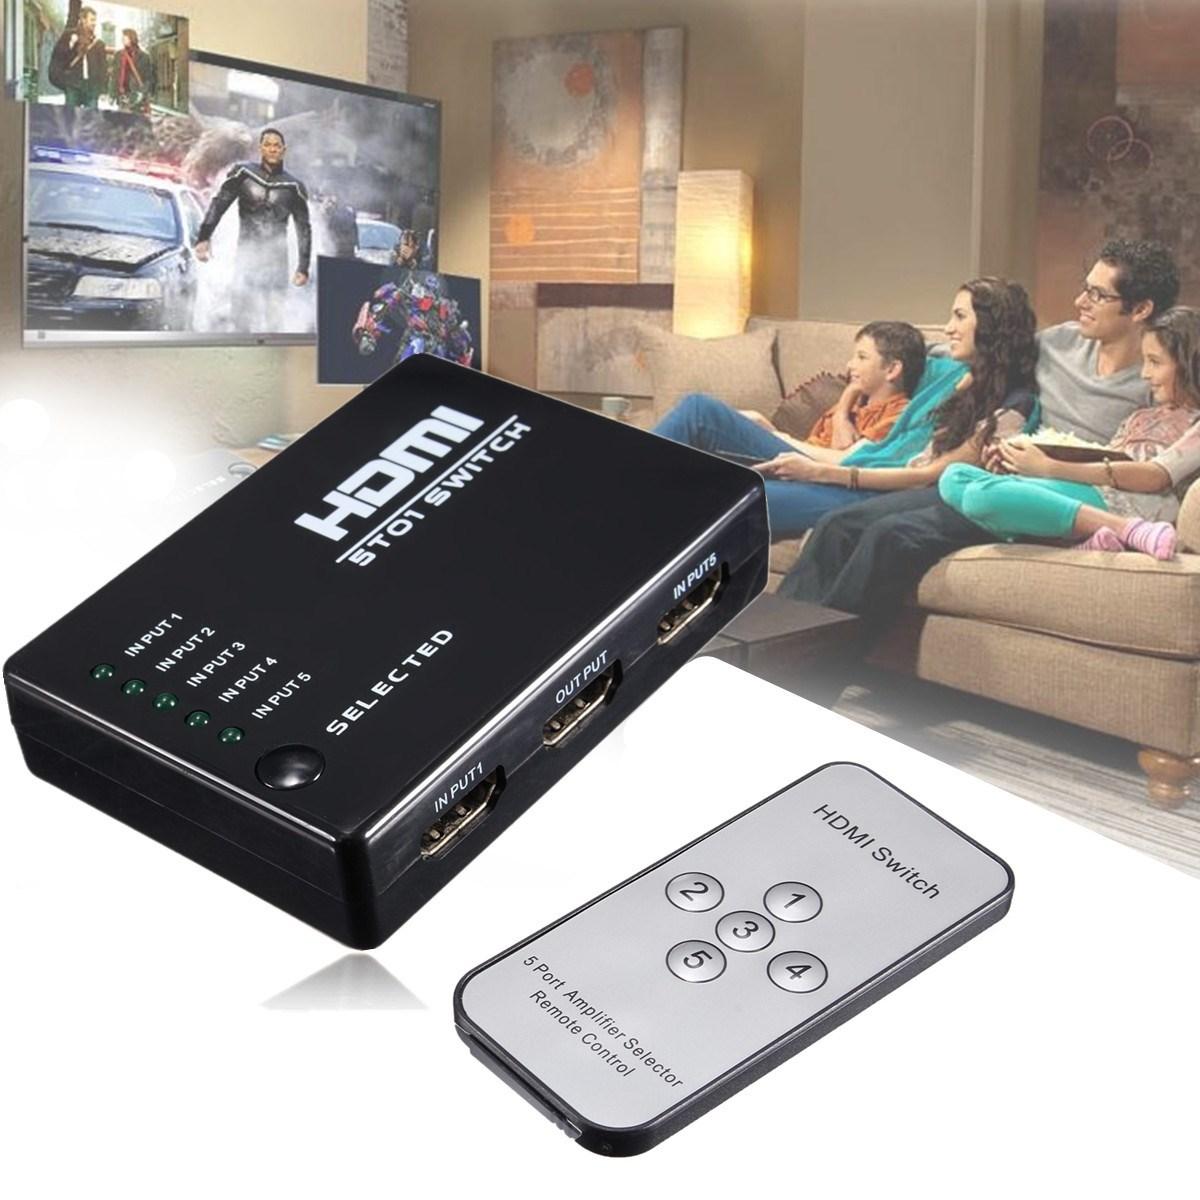 HDMI True Matrix 3 / 5 Port HDMI Switch Switcher HDMI Splitter Hub Box for PS3 for Xbox 360 HDTV DVD with IR Wireless Remote(China (Mainland))